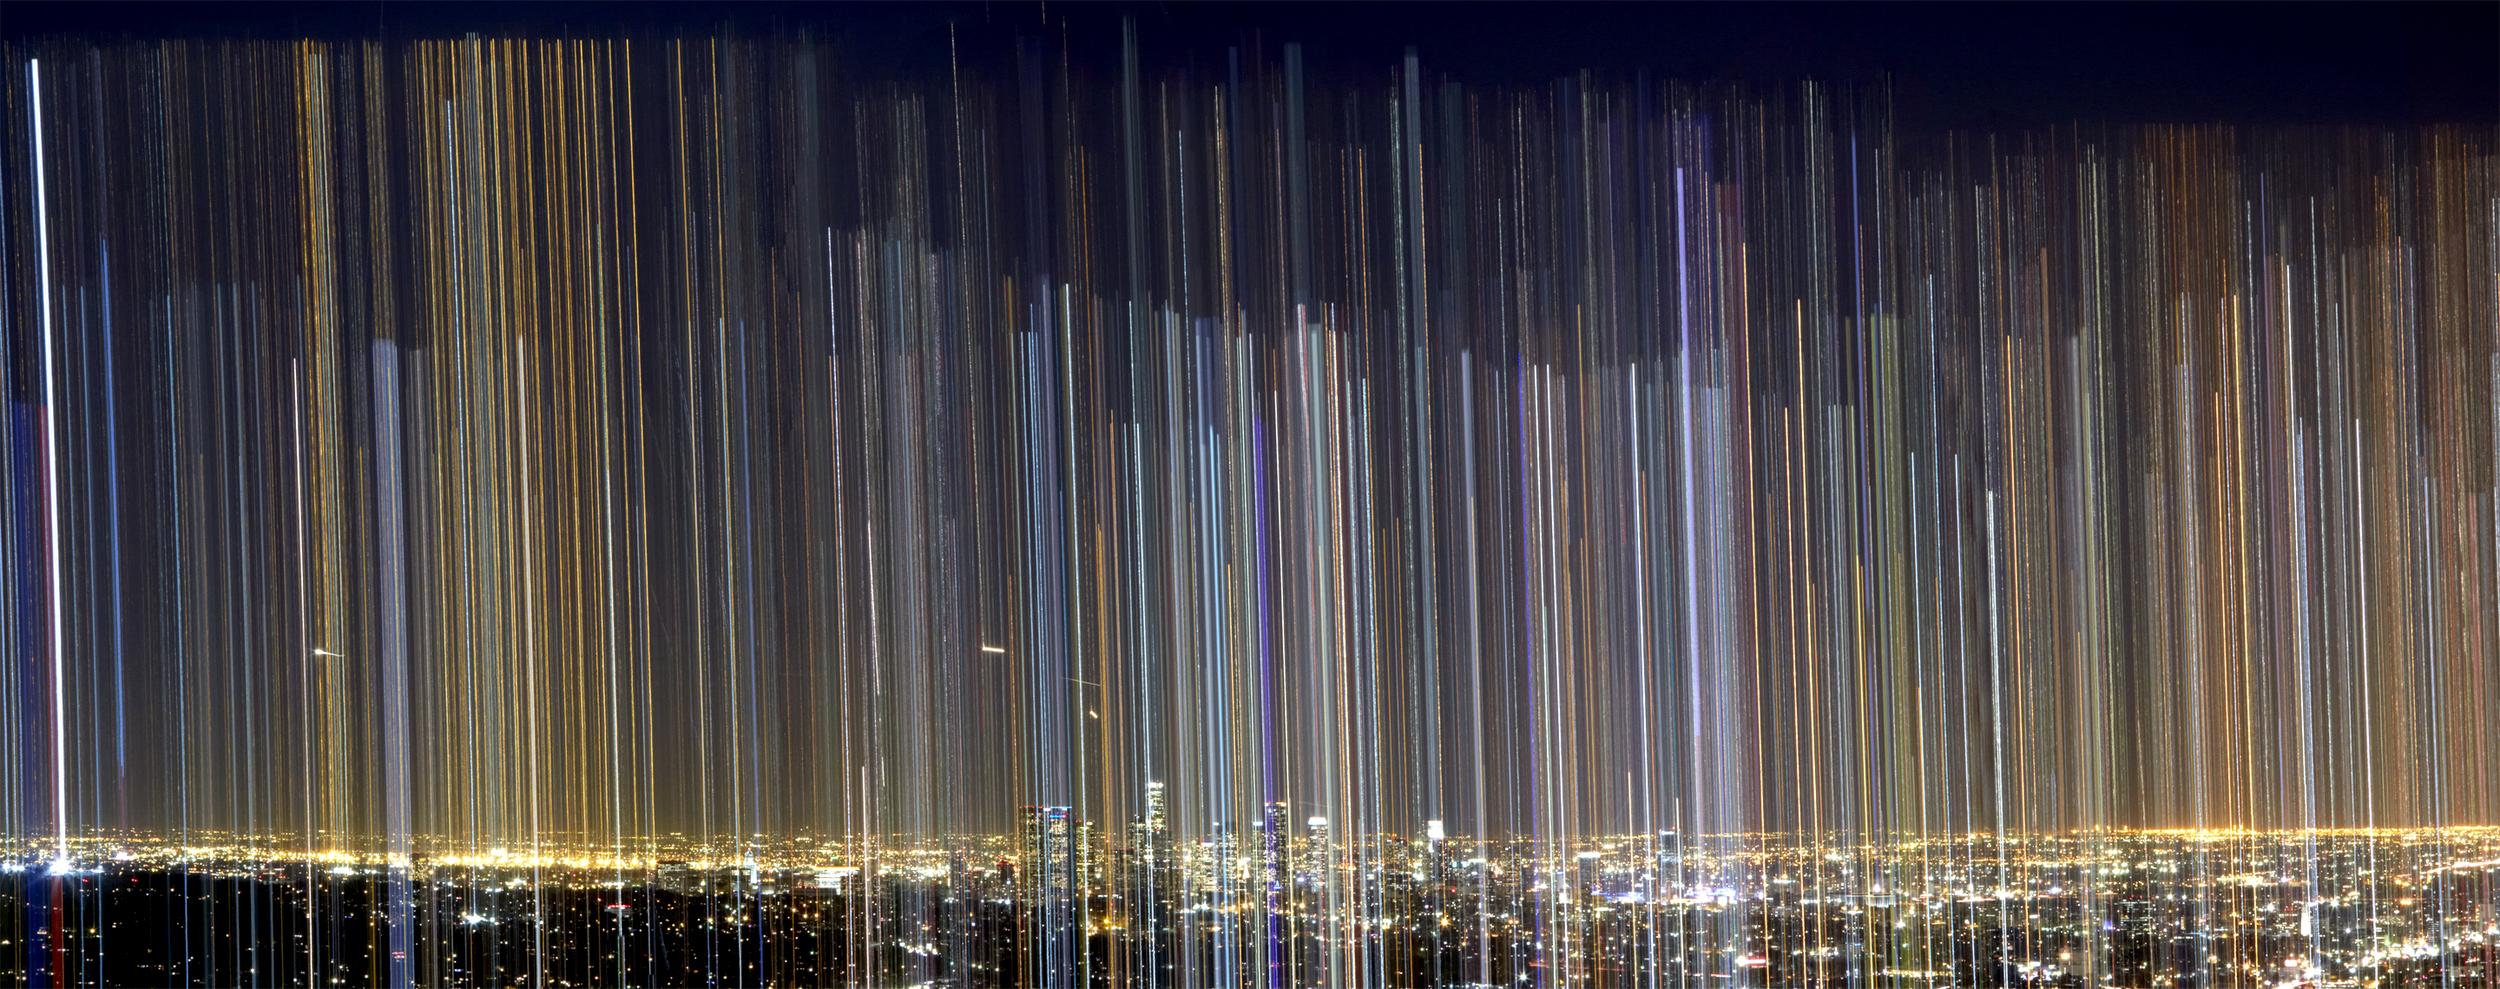 DTOWN CRAZY COLOR UPSIDE LIGHTSCRAPE.jpg